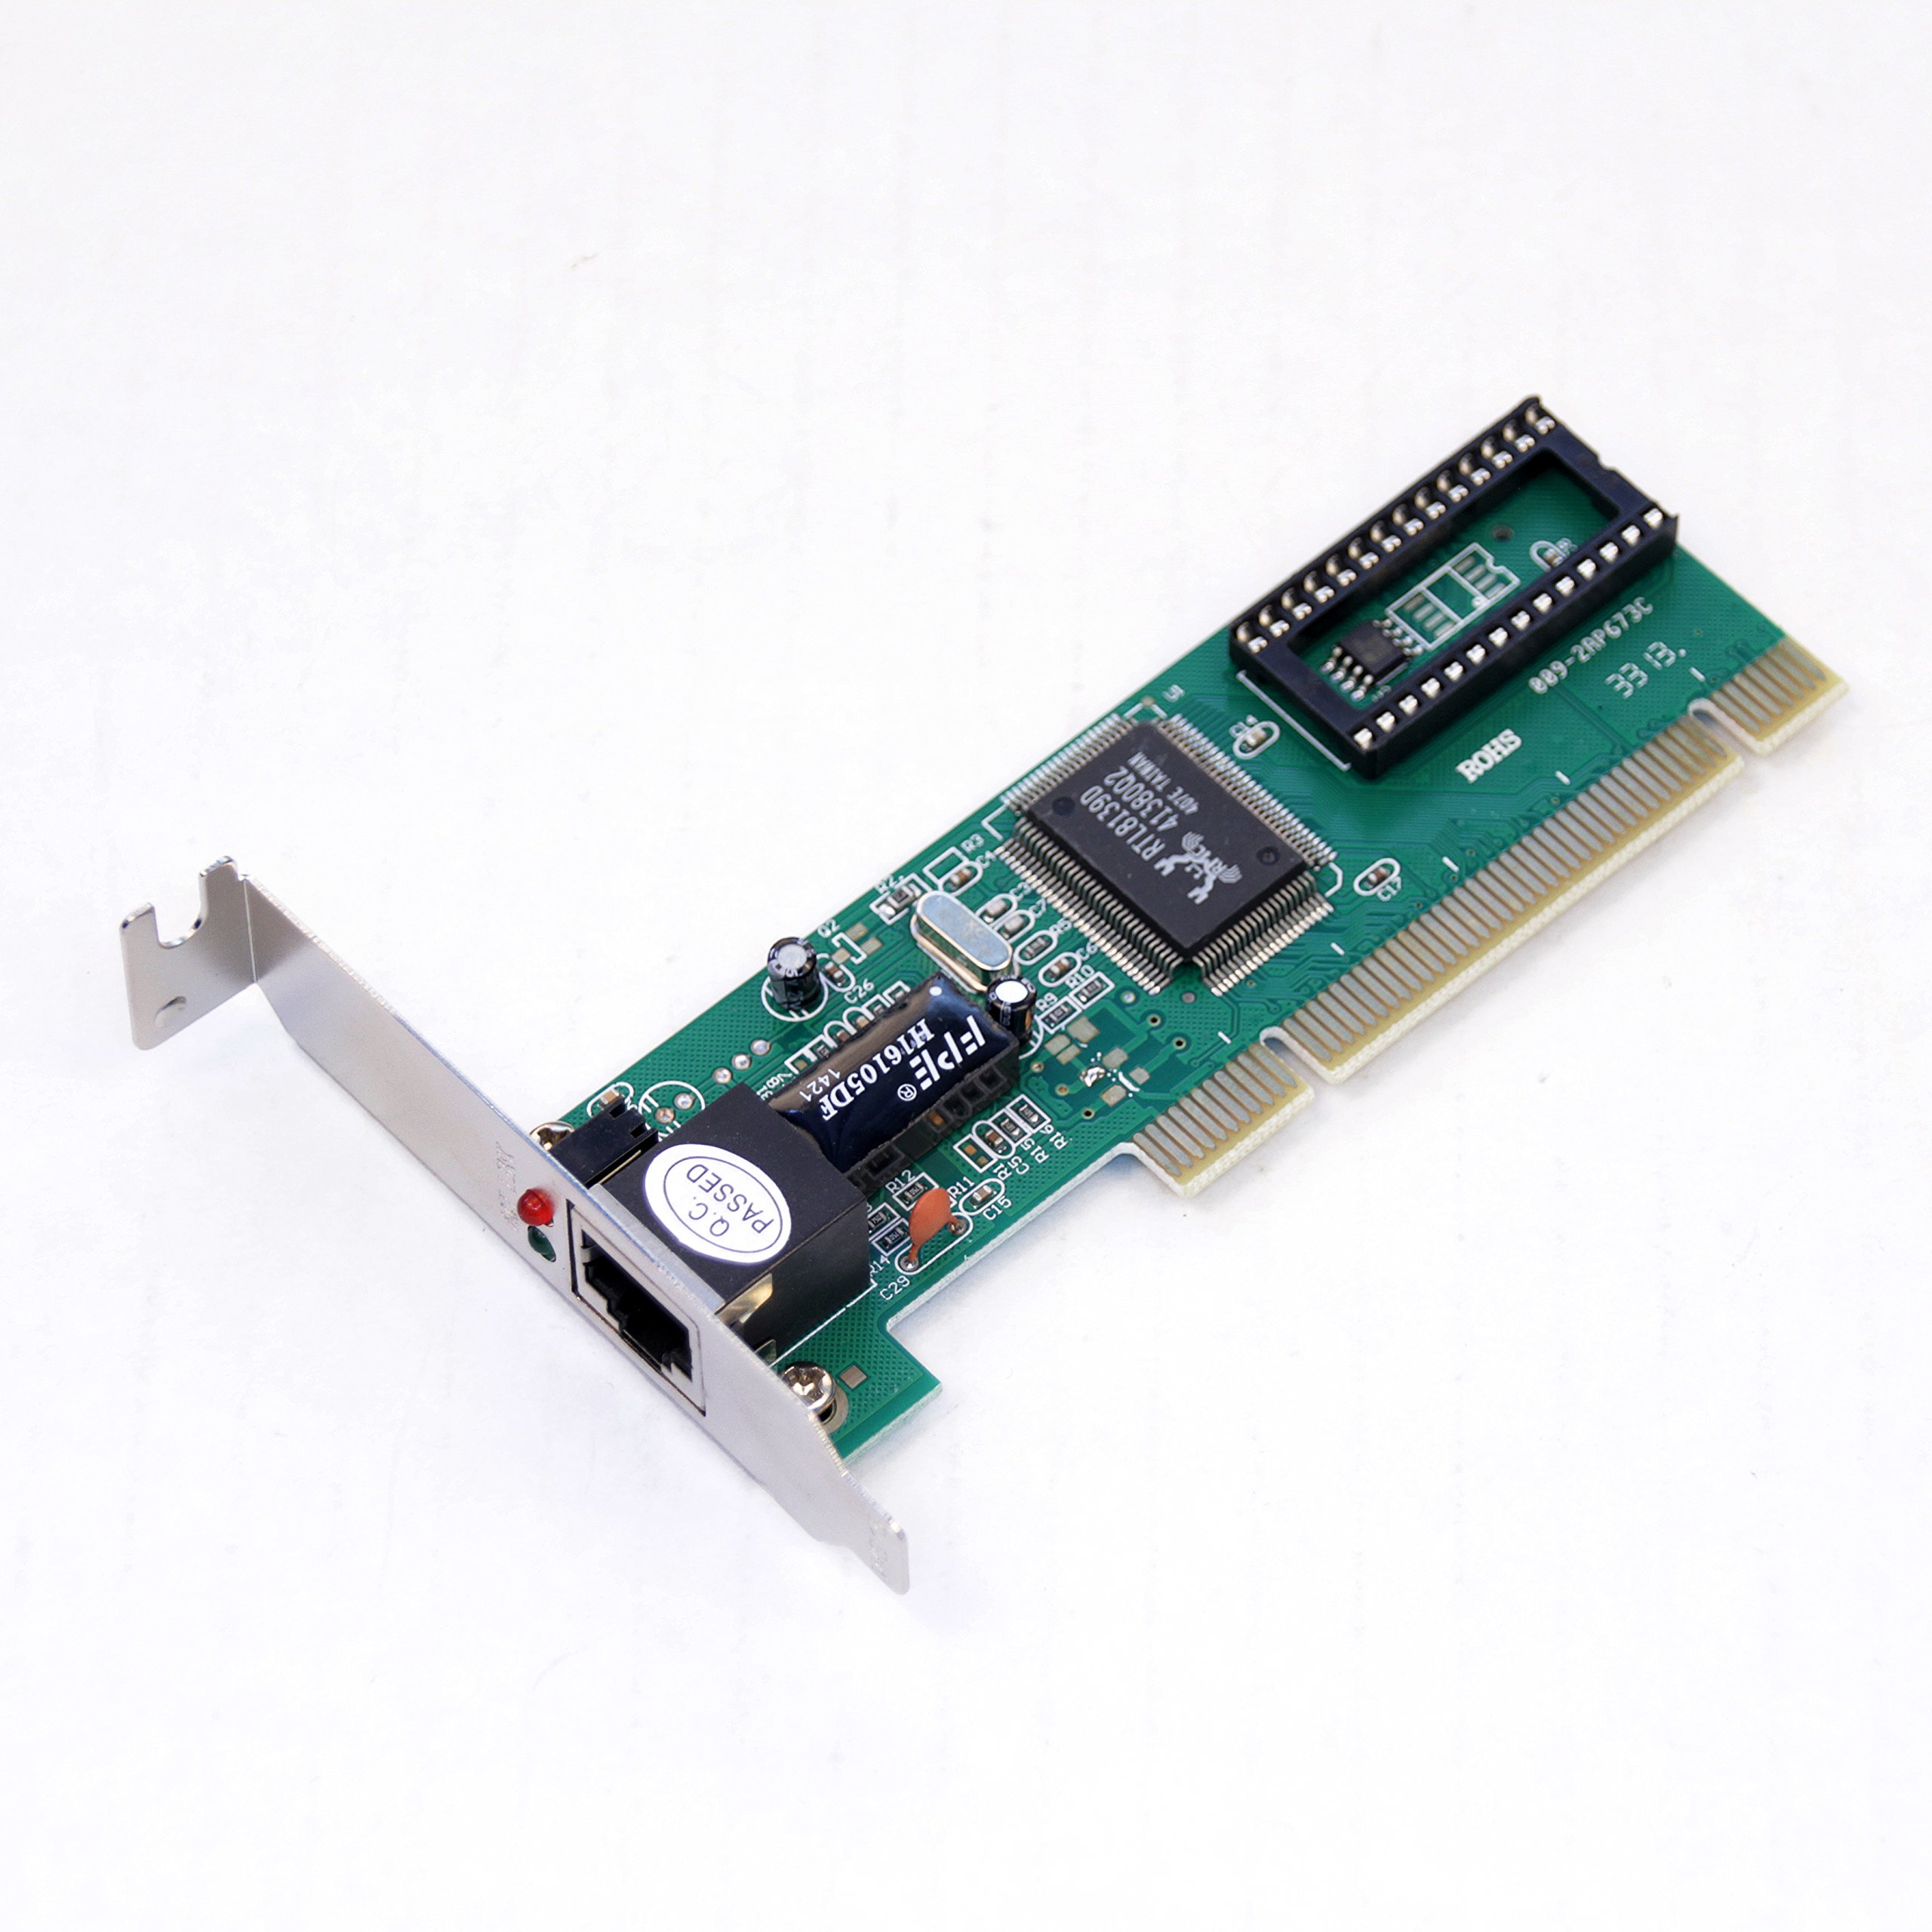 Realtek RTL8139D 10/100M Low-Profile Fast Ethernet Network Interface Card NIC (Driver Download)